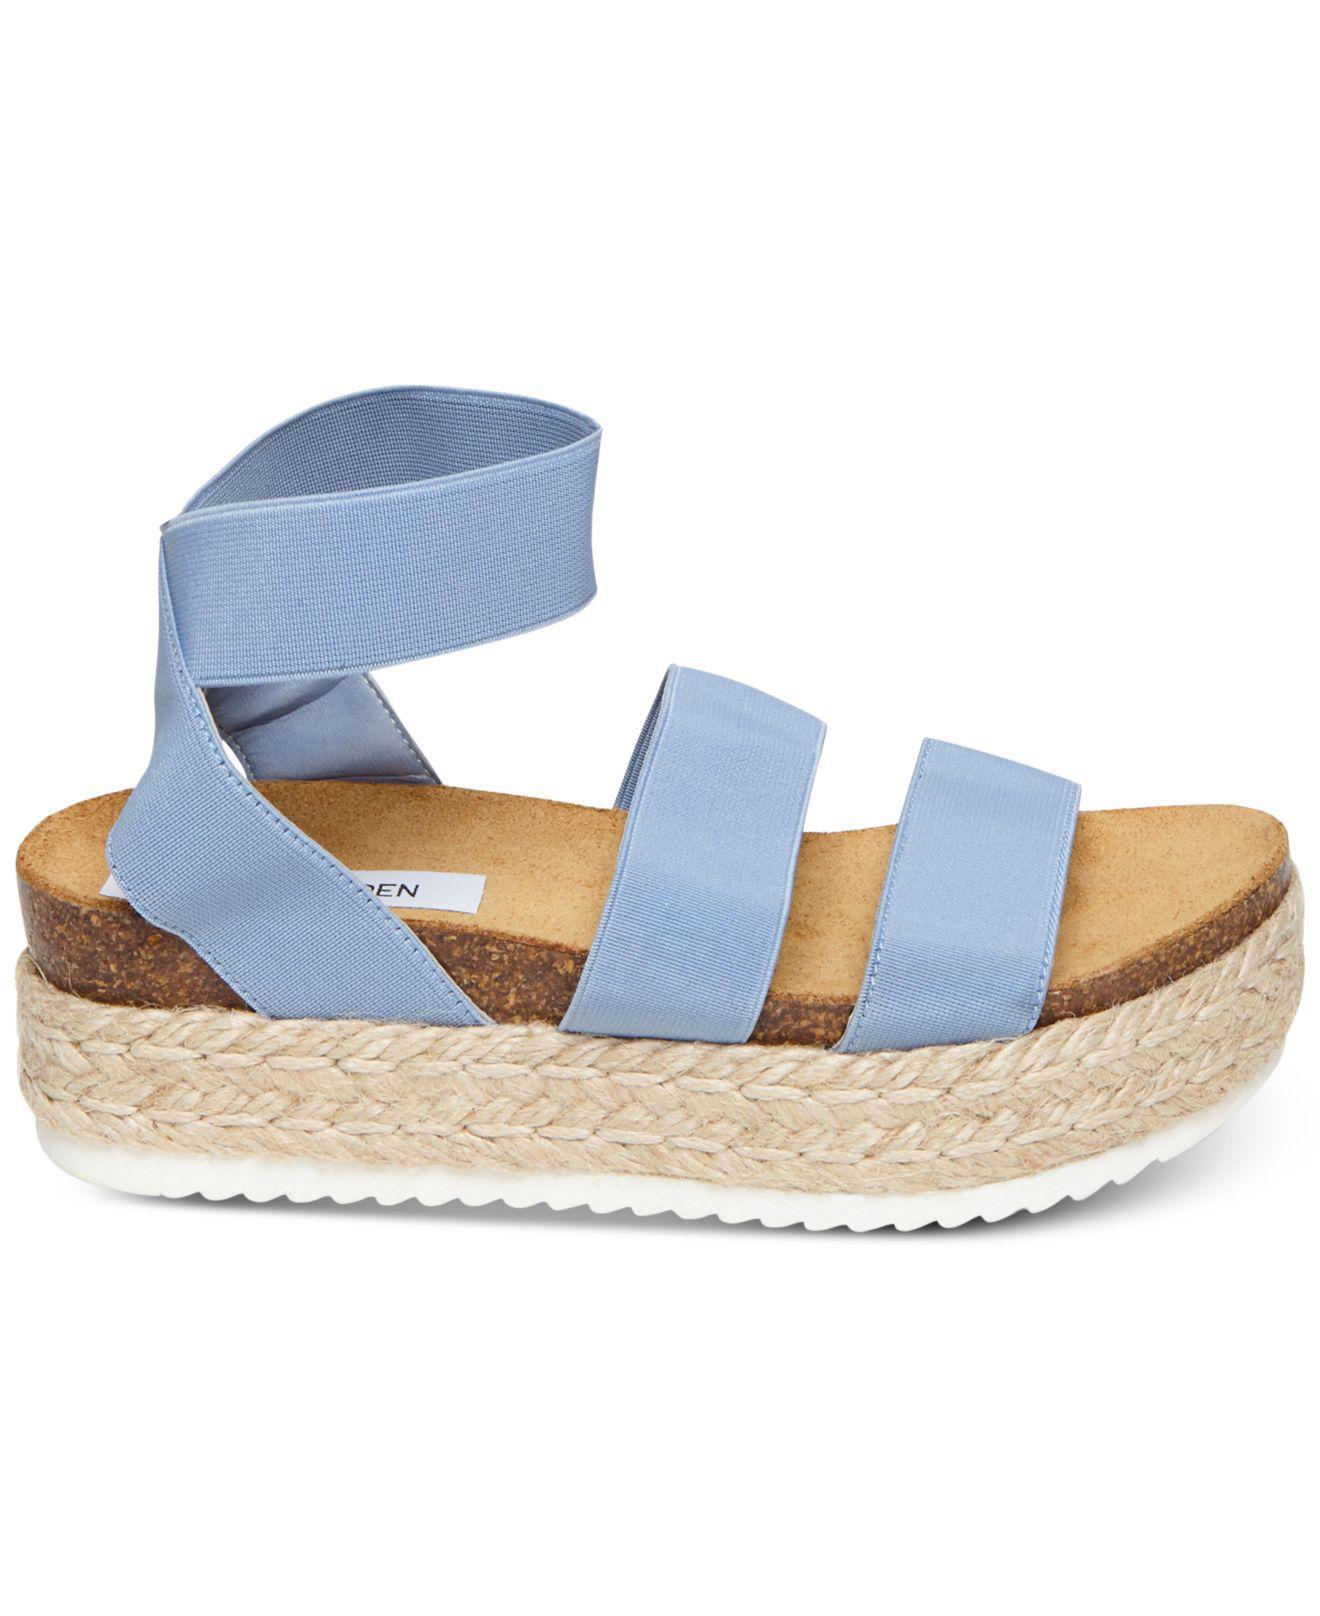 9cc8ca9483b2a5 Lyst - Steve Madden Kimmie Espadrille Sandal (black) Women s Shoes in Blue